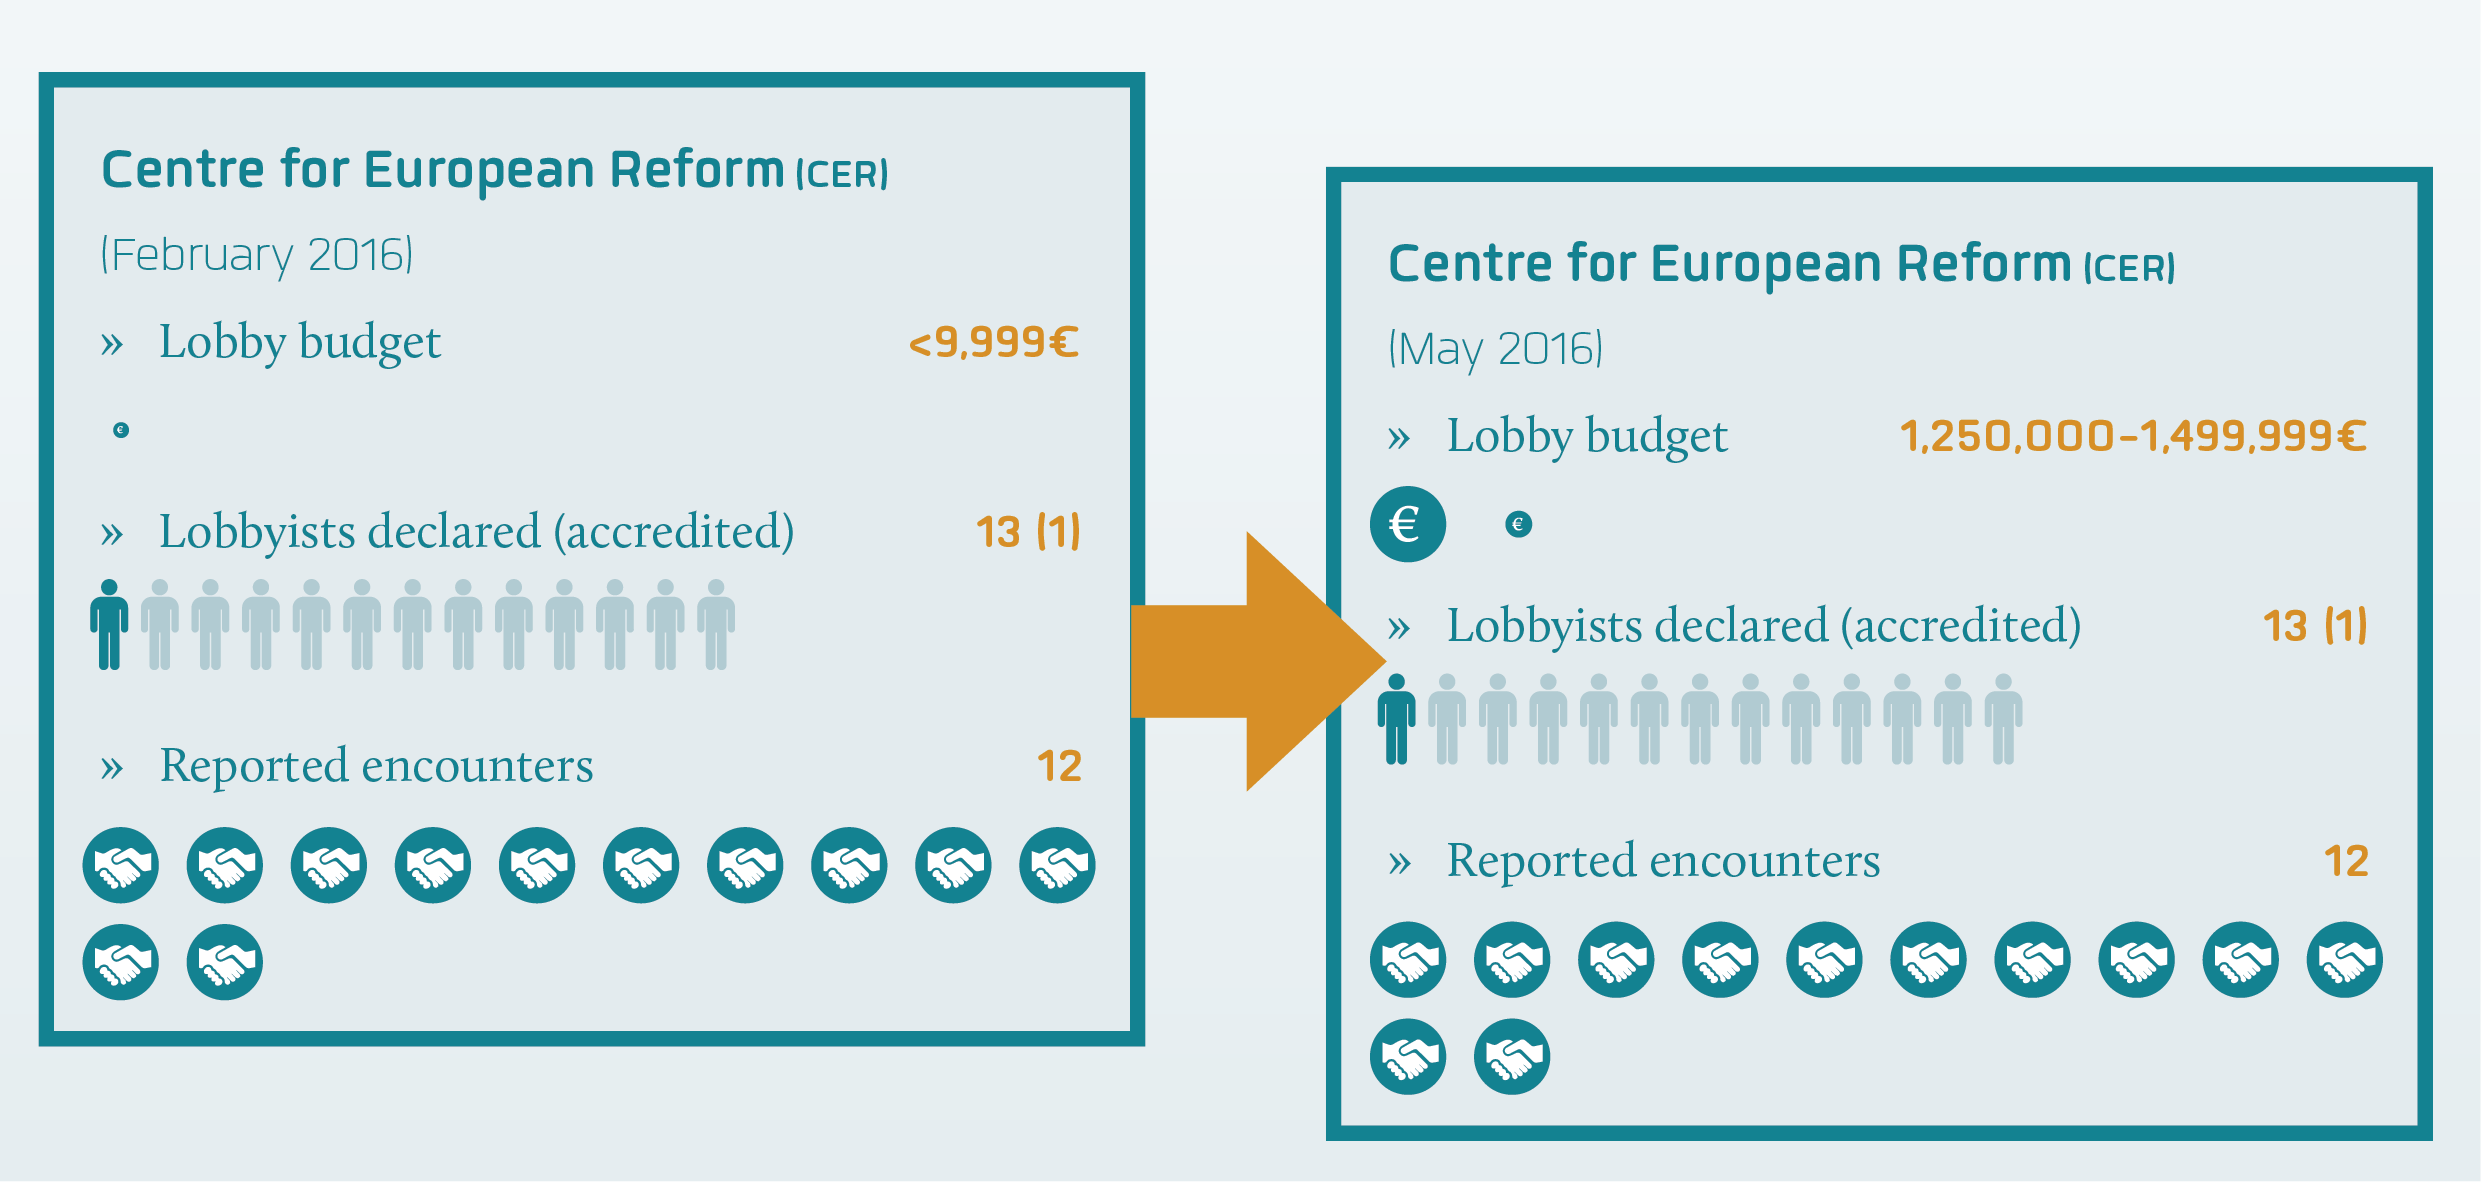 CER declared status February versus May 2016